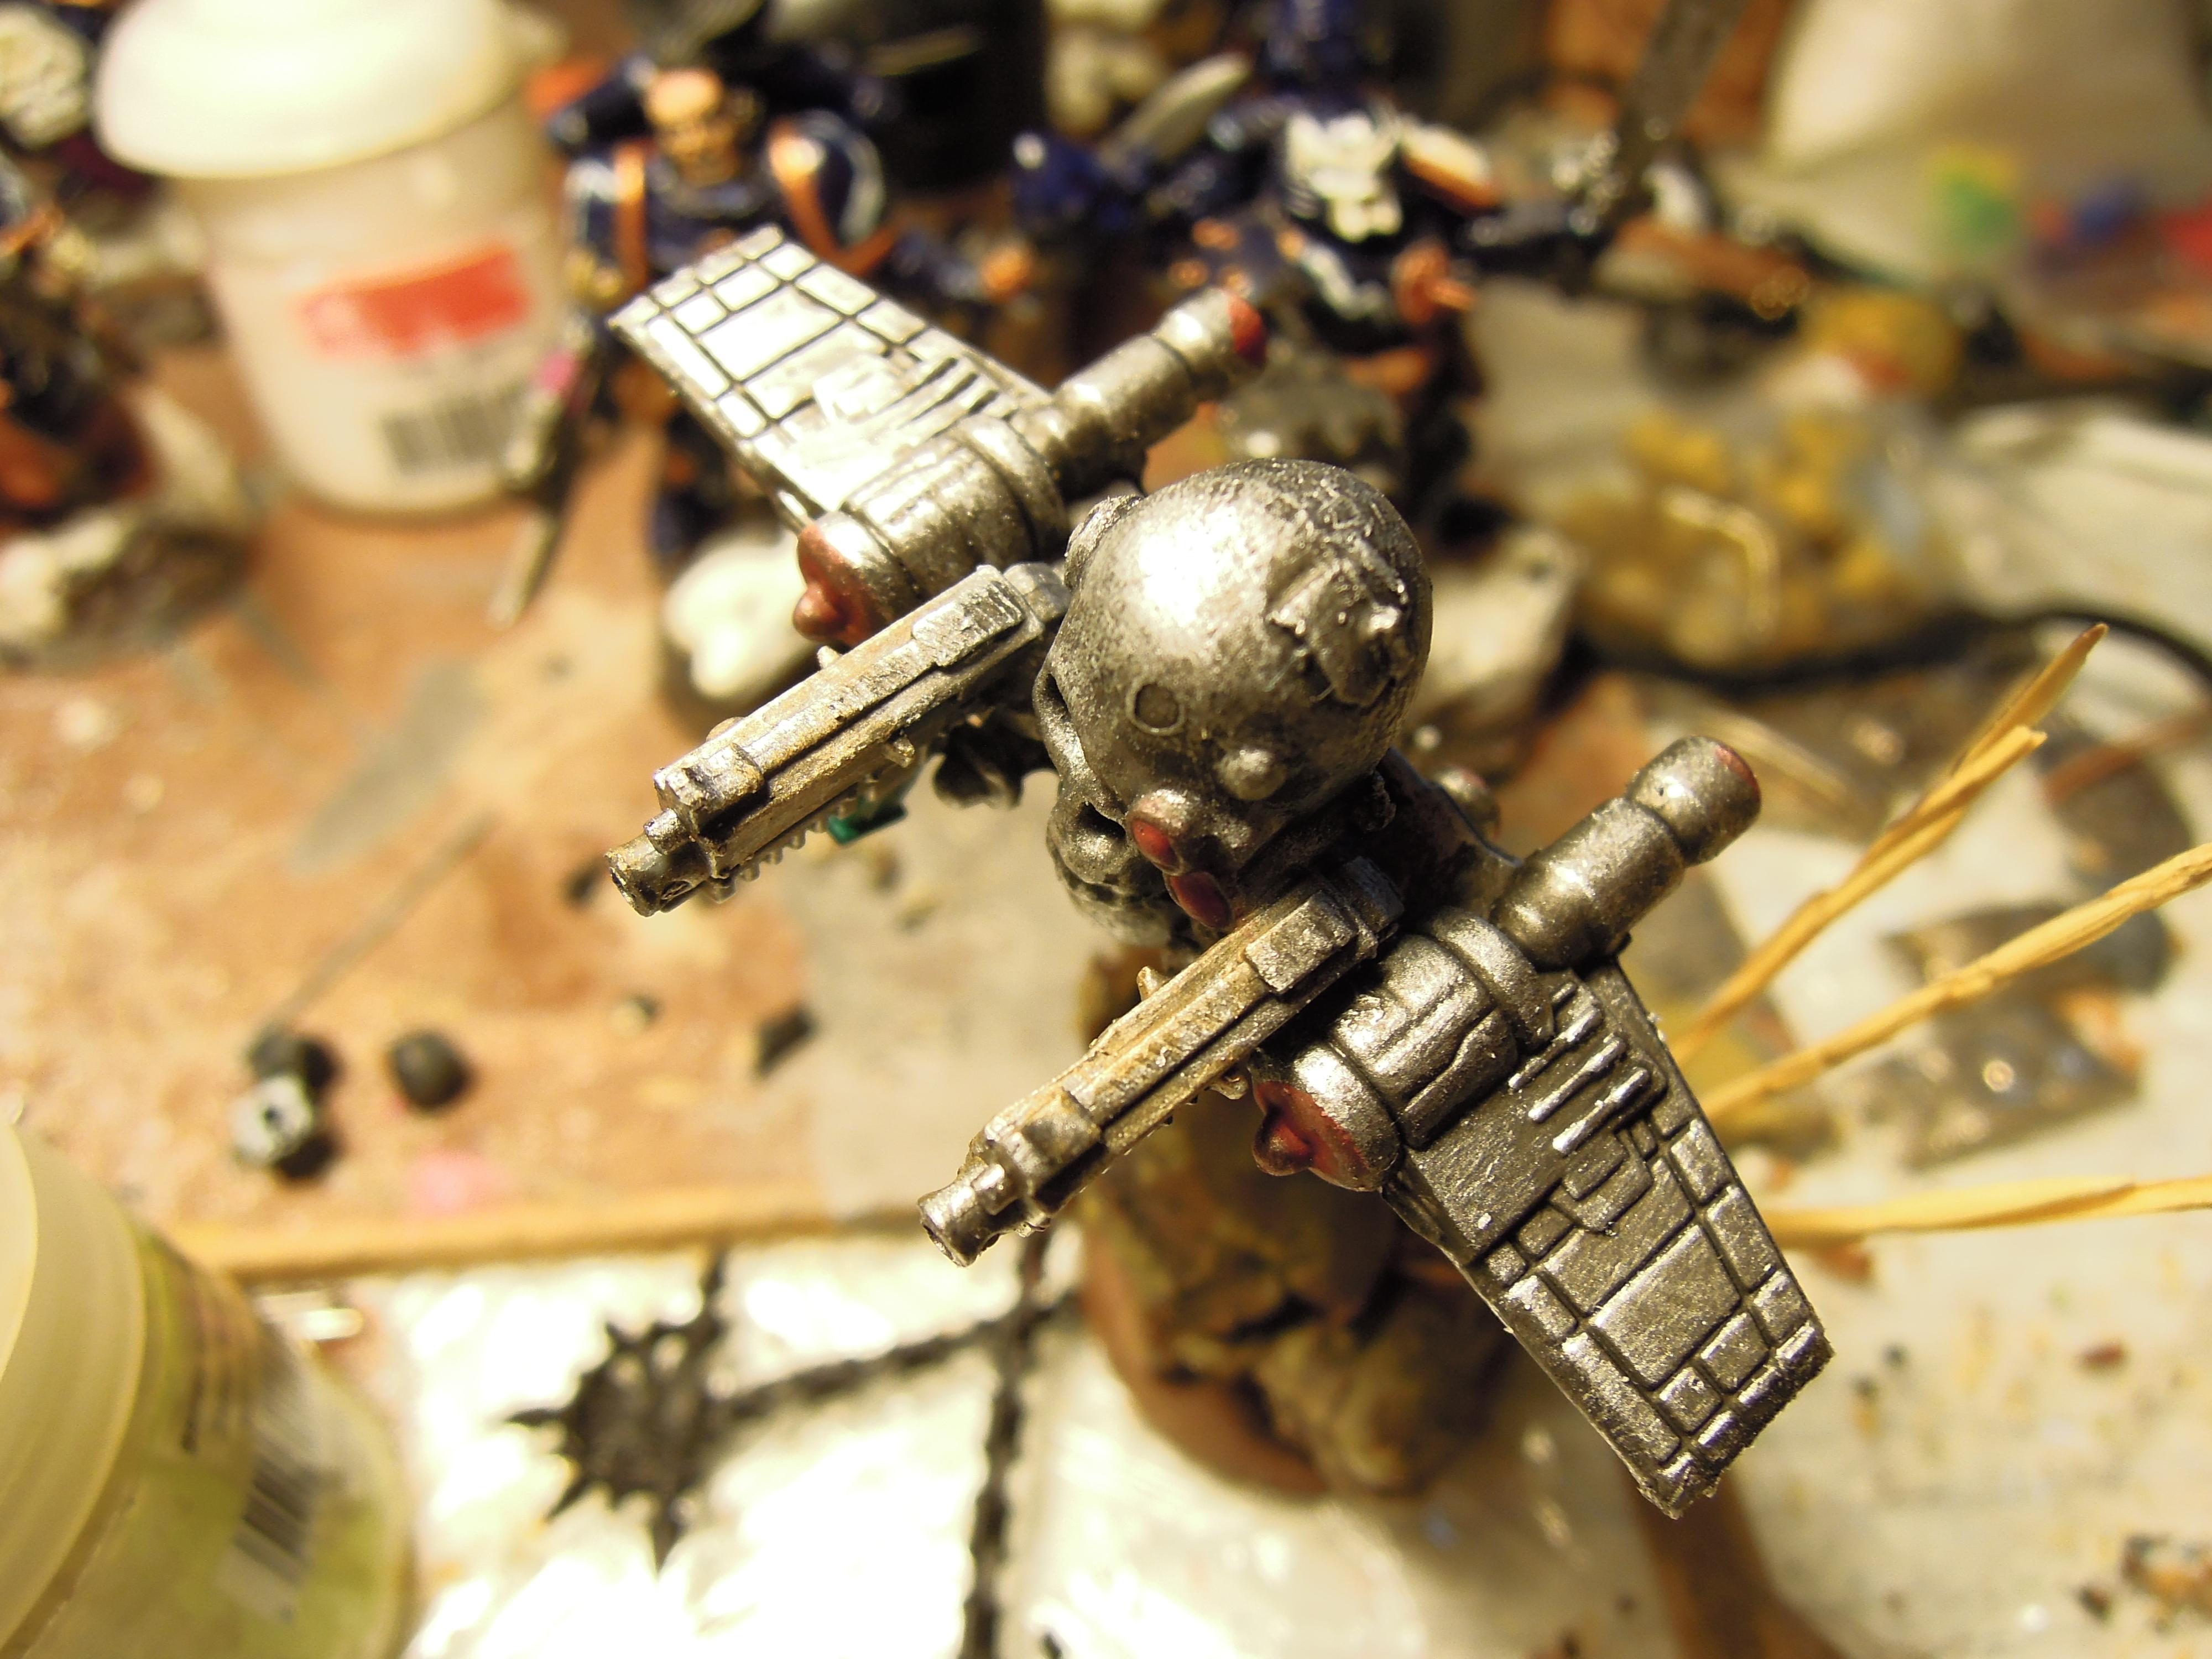 Admech, Chaos, Conversion, Cyborg, Dark Mechanicus, Heresy, Kitbash, Retinue, Scratch Build, Servitors, Strogg, Warhammer 40,000